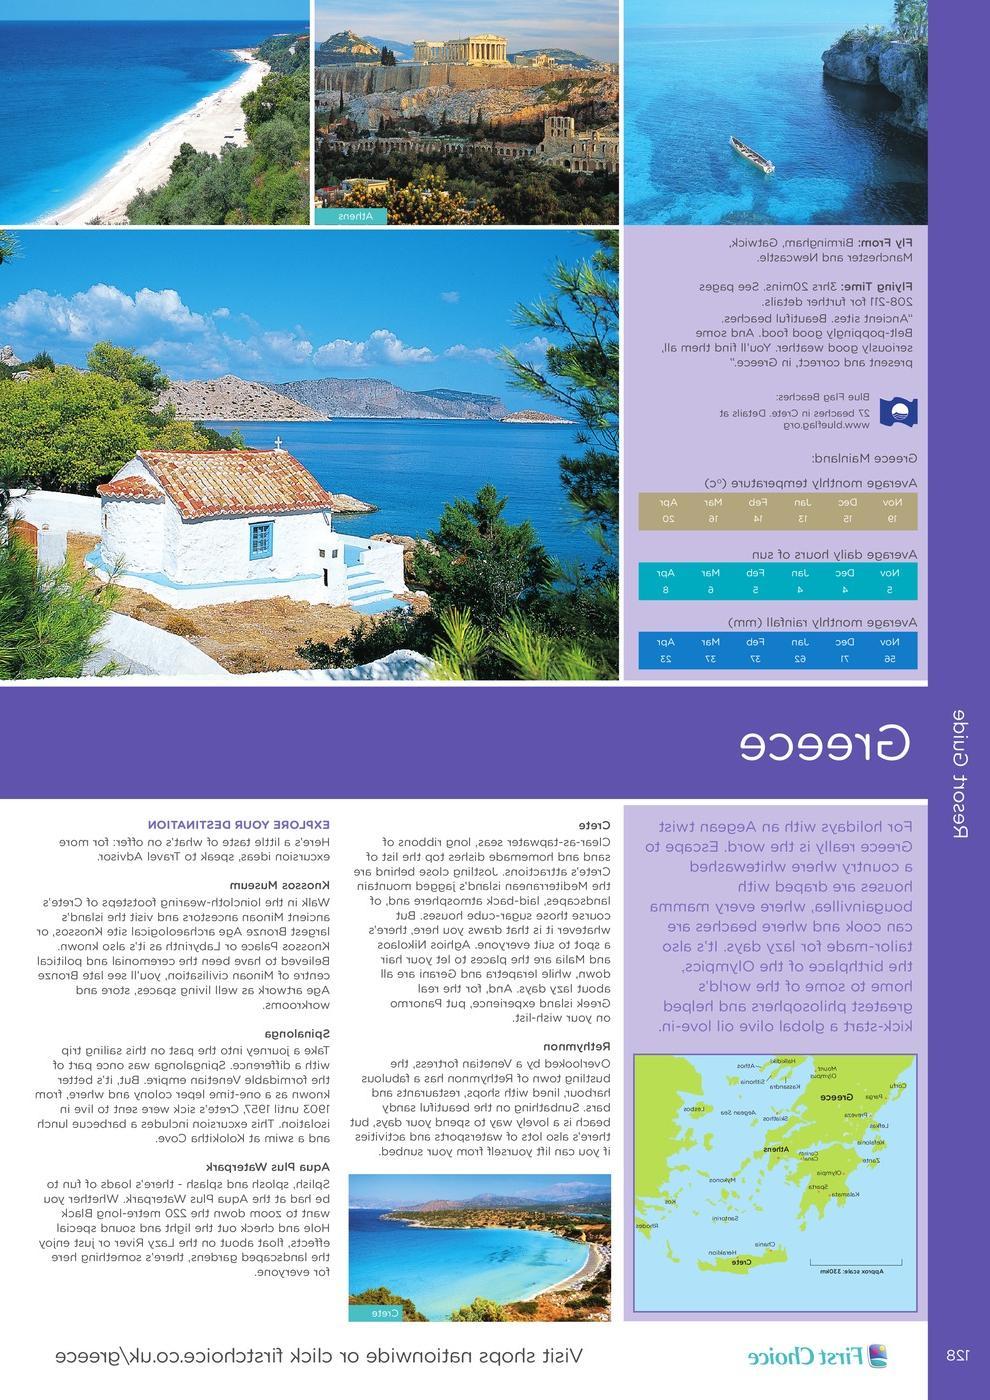 Greece - First Choice Winter Sun November 2011 - April 2012  August Edition